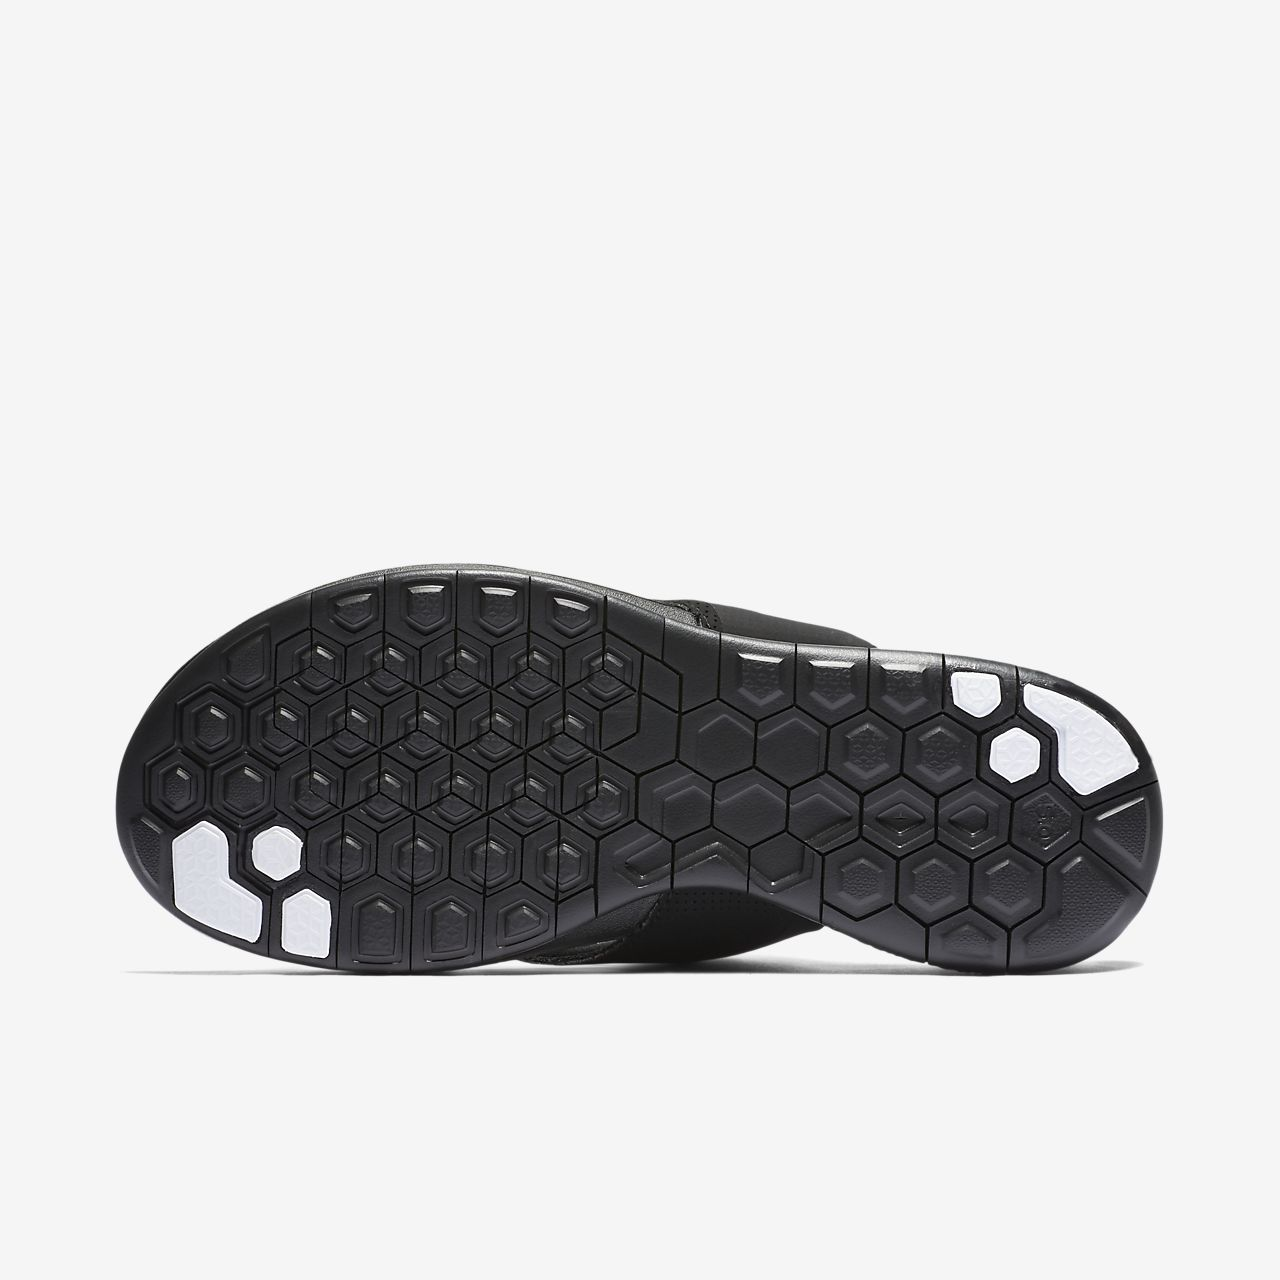 5e5f7d7a5332 Hurley Phantom Free Men s Sandal. Nike.com ZA